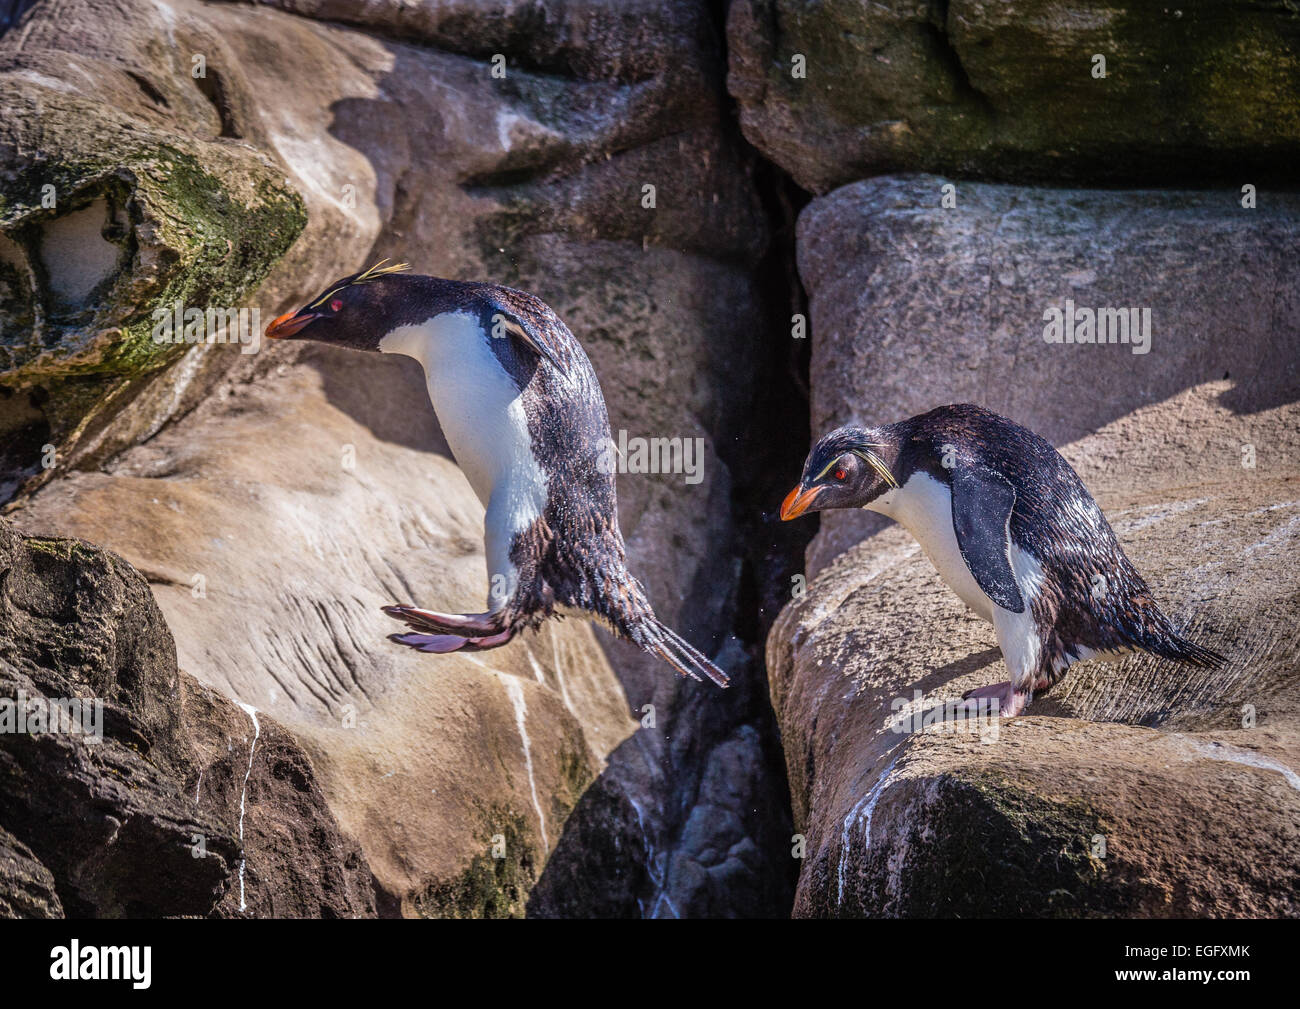 Rockhopper Penguin leaping over a gully - Stock Image